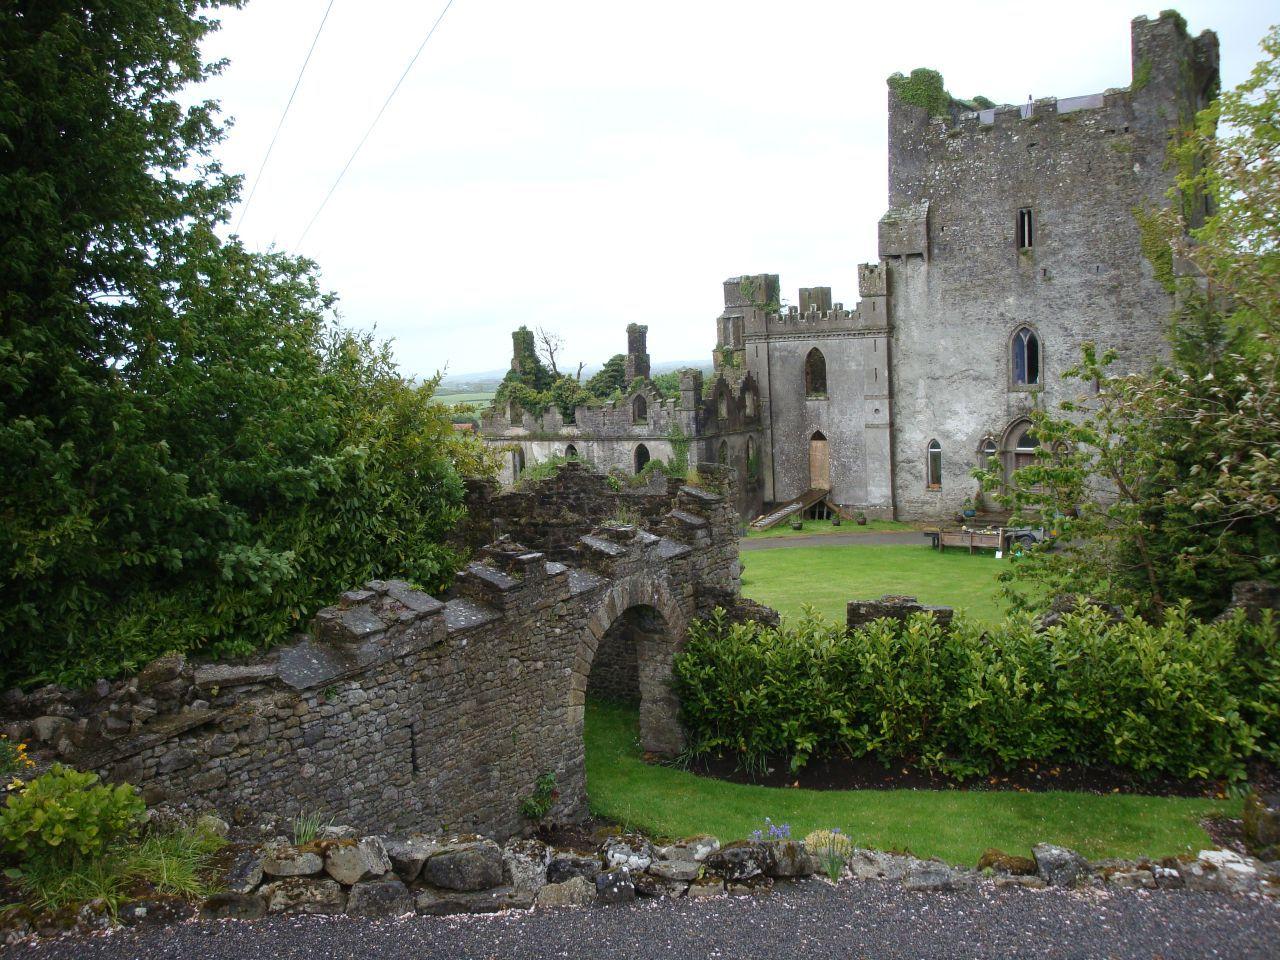 Leap Castle: The Complete Guide